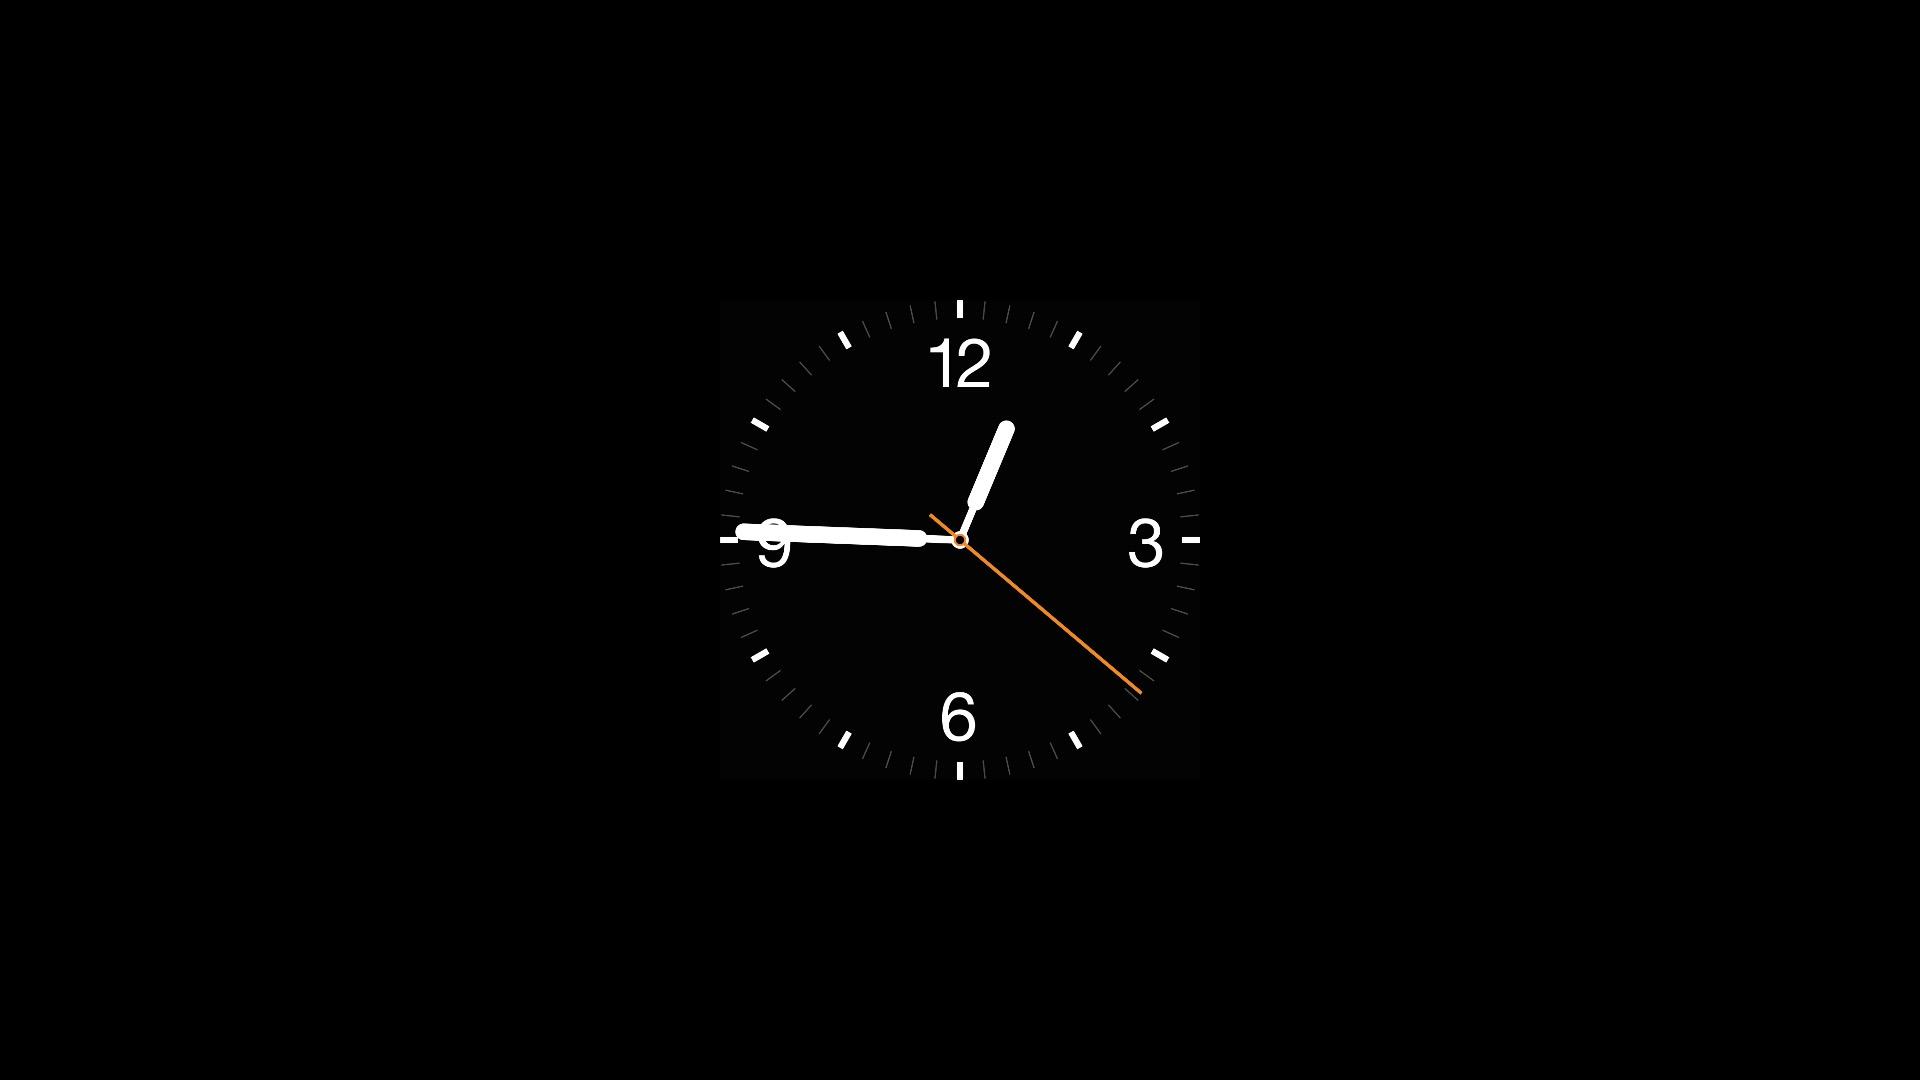 Apple Watch screen saver on a Mac